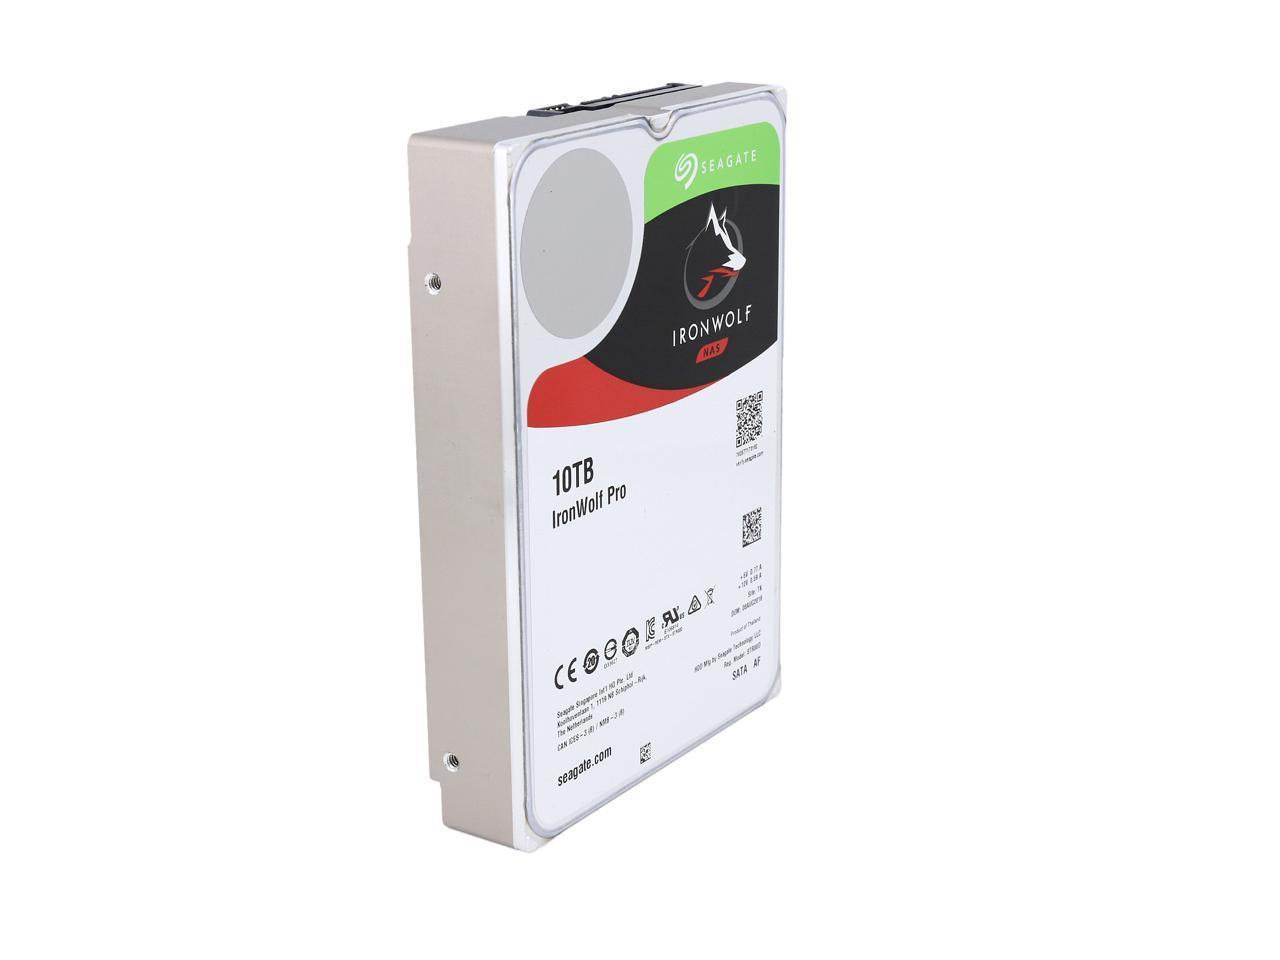 Seagate Ironwolf Pro 10tb Nas Hard Drive 7200 Rpm 256mb Cache Sata 6 0gb S 3 5 Internal Hard Drive St10000ne0004 Newegg Com